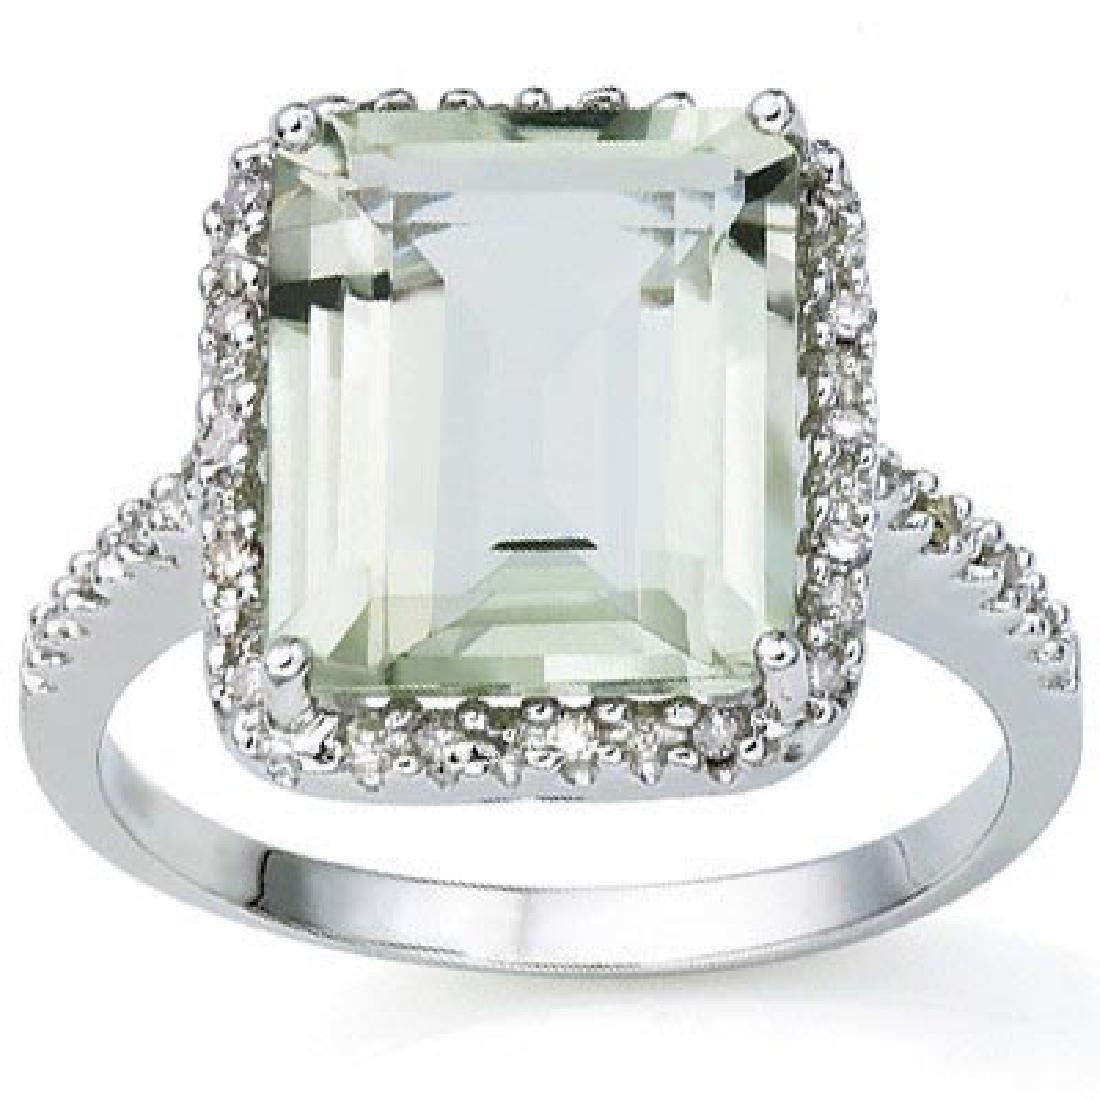 6.06 CARAT TW (3 PCS) GREEN AMETHYST & GENUINE DIAMOND